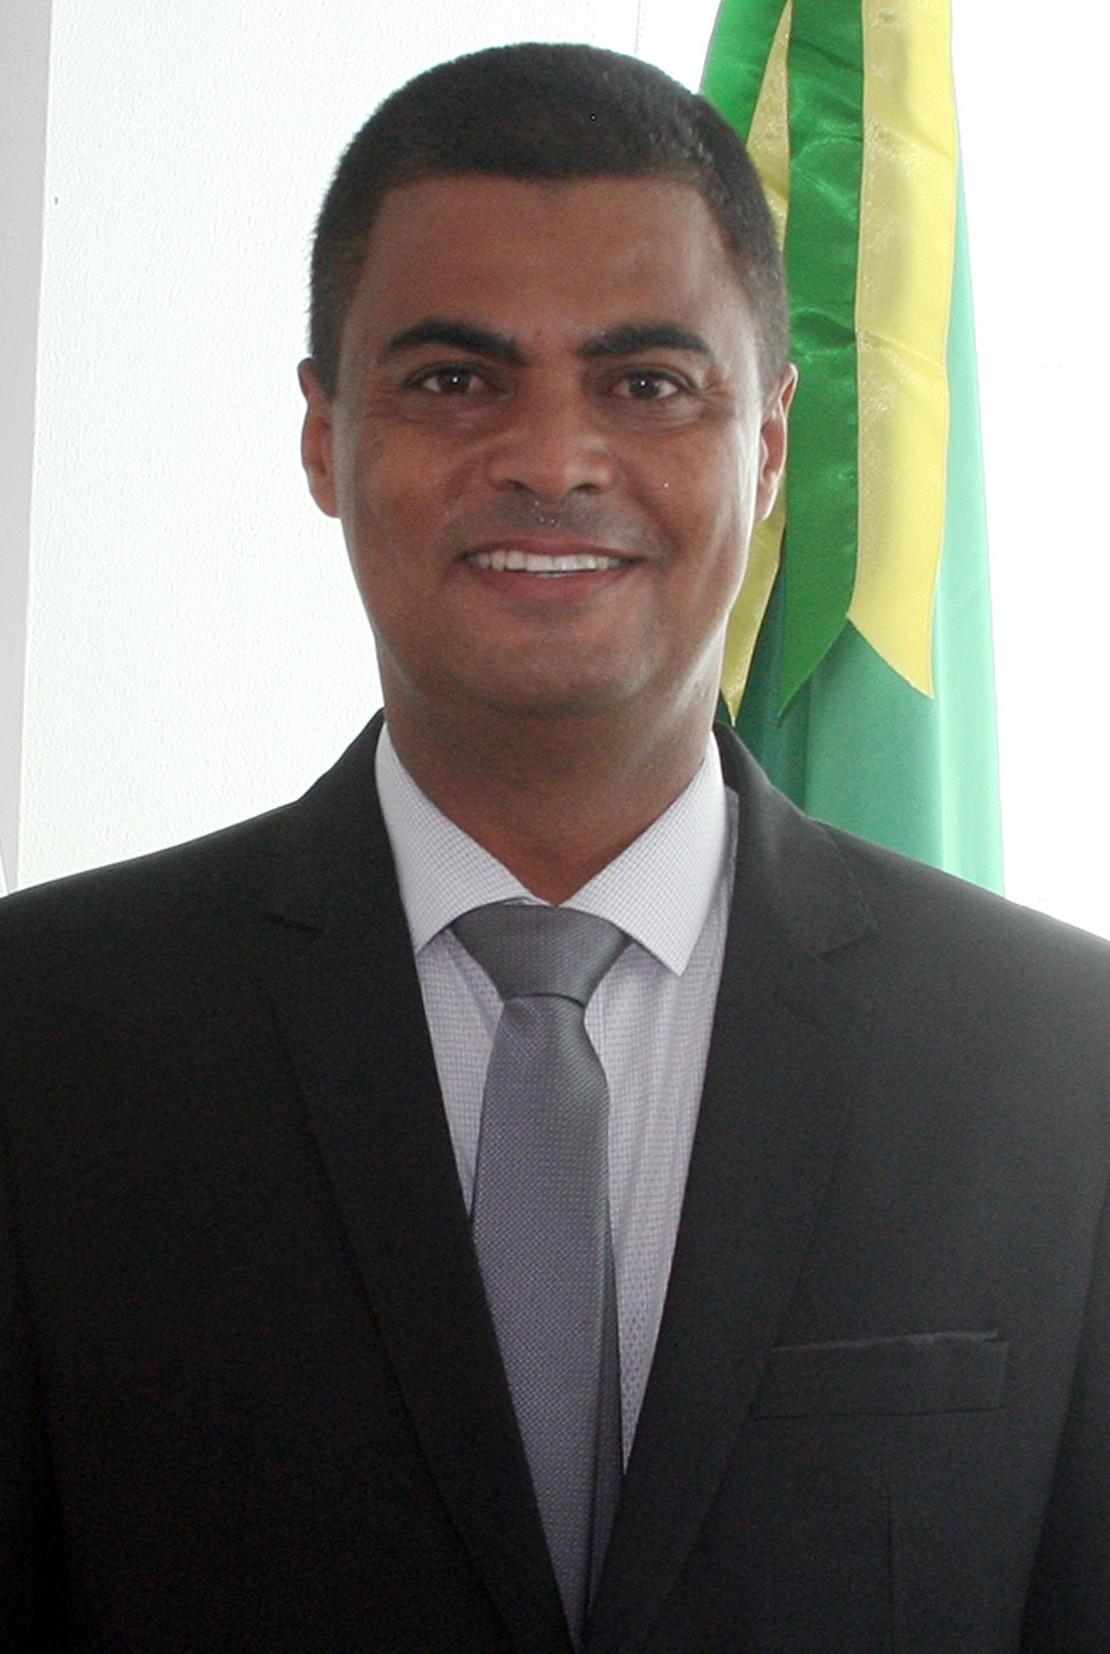 Fausto Soares